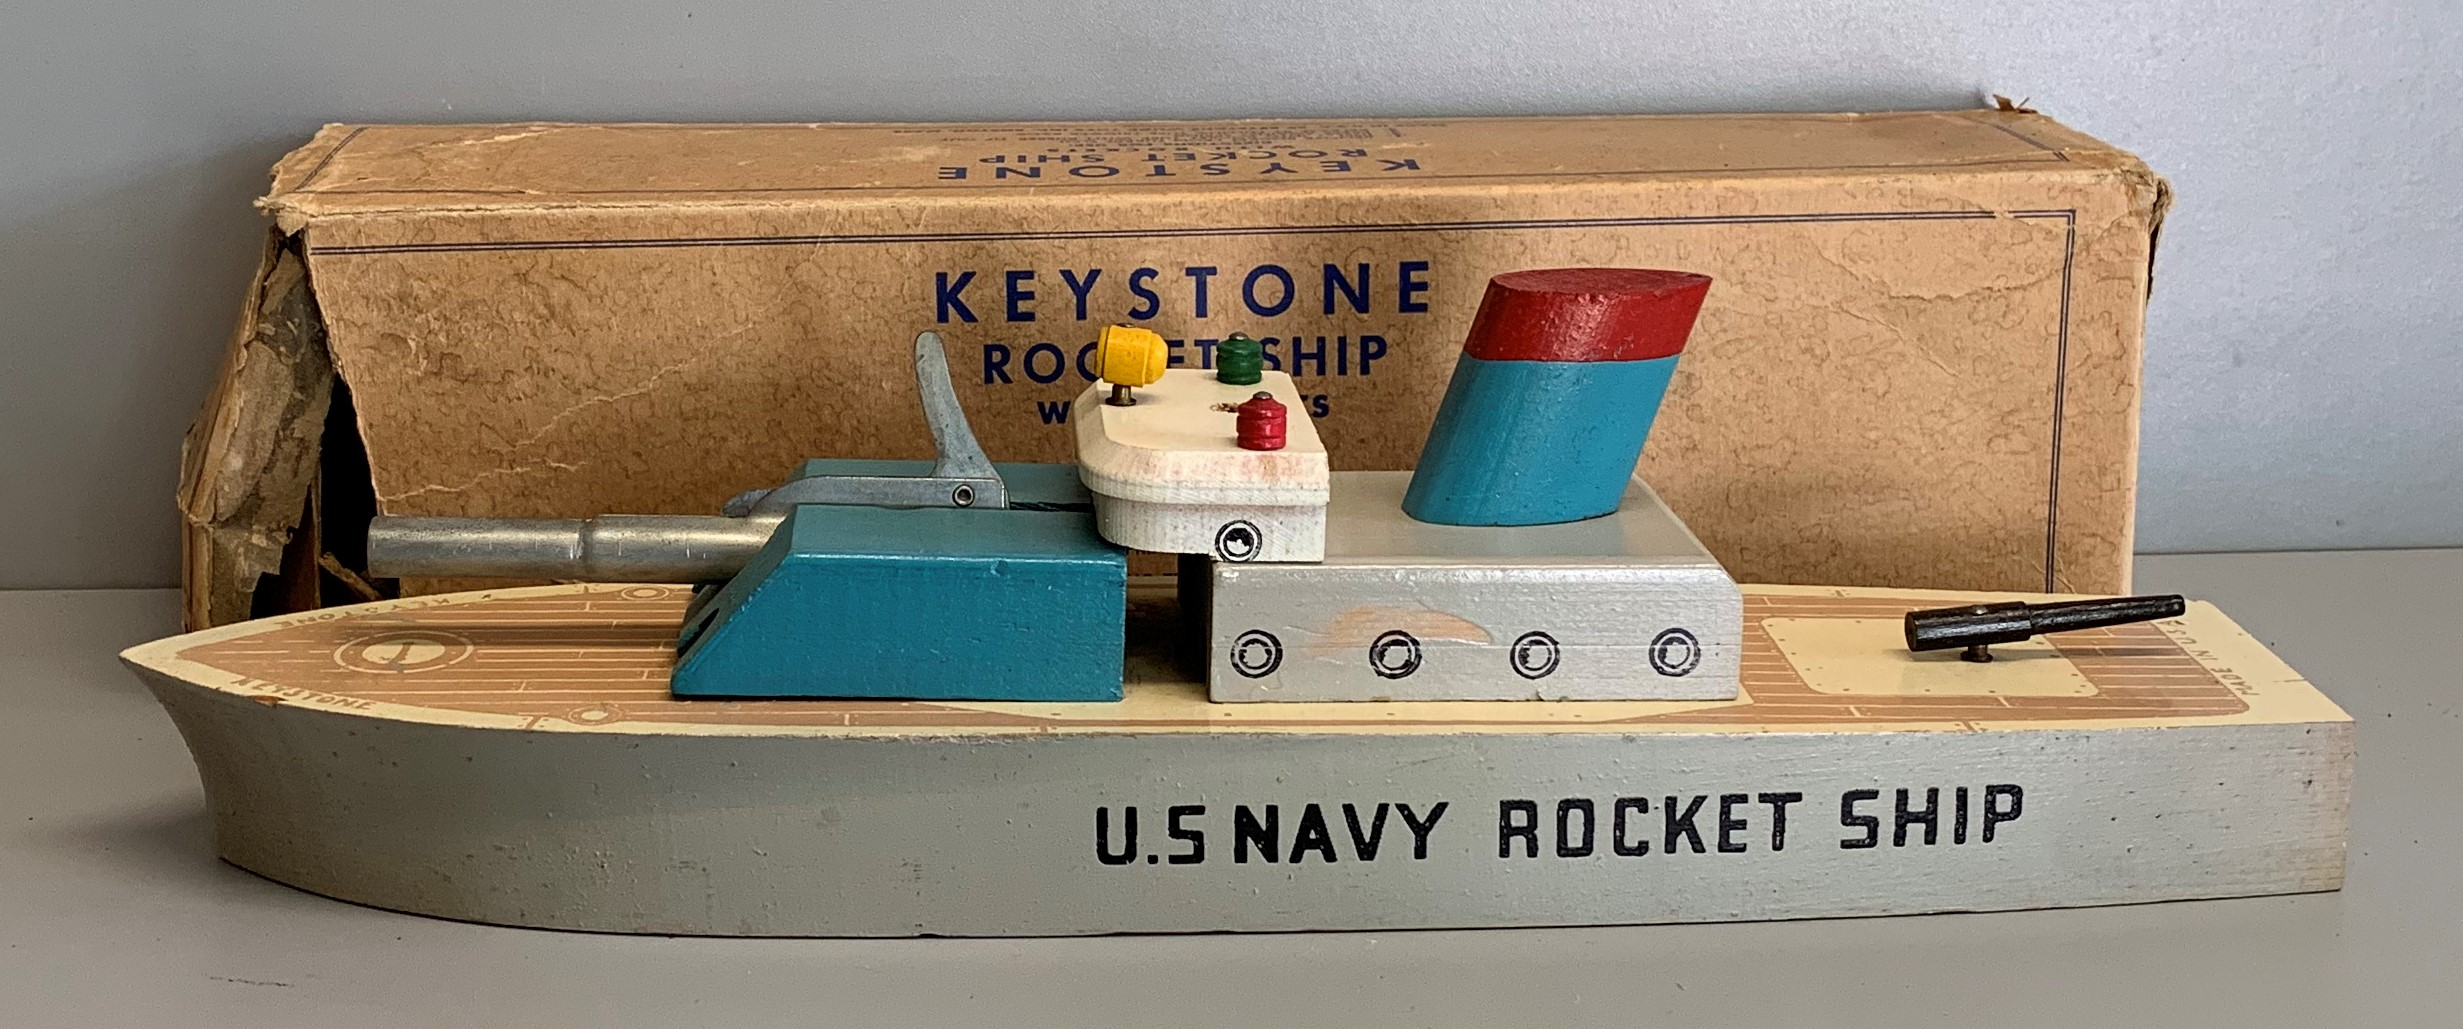 Rocket Ship #352